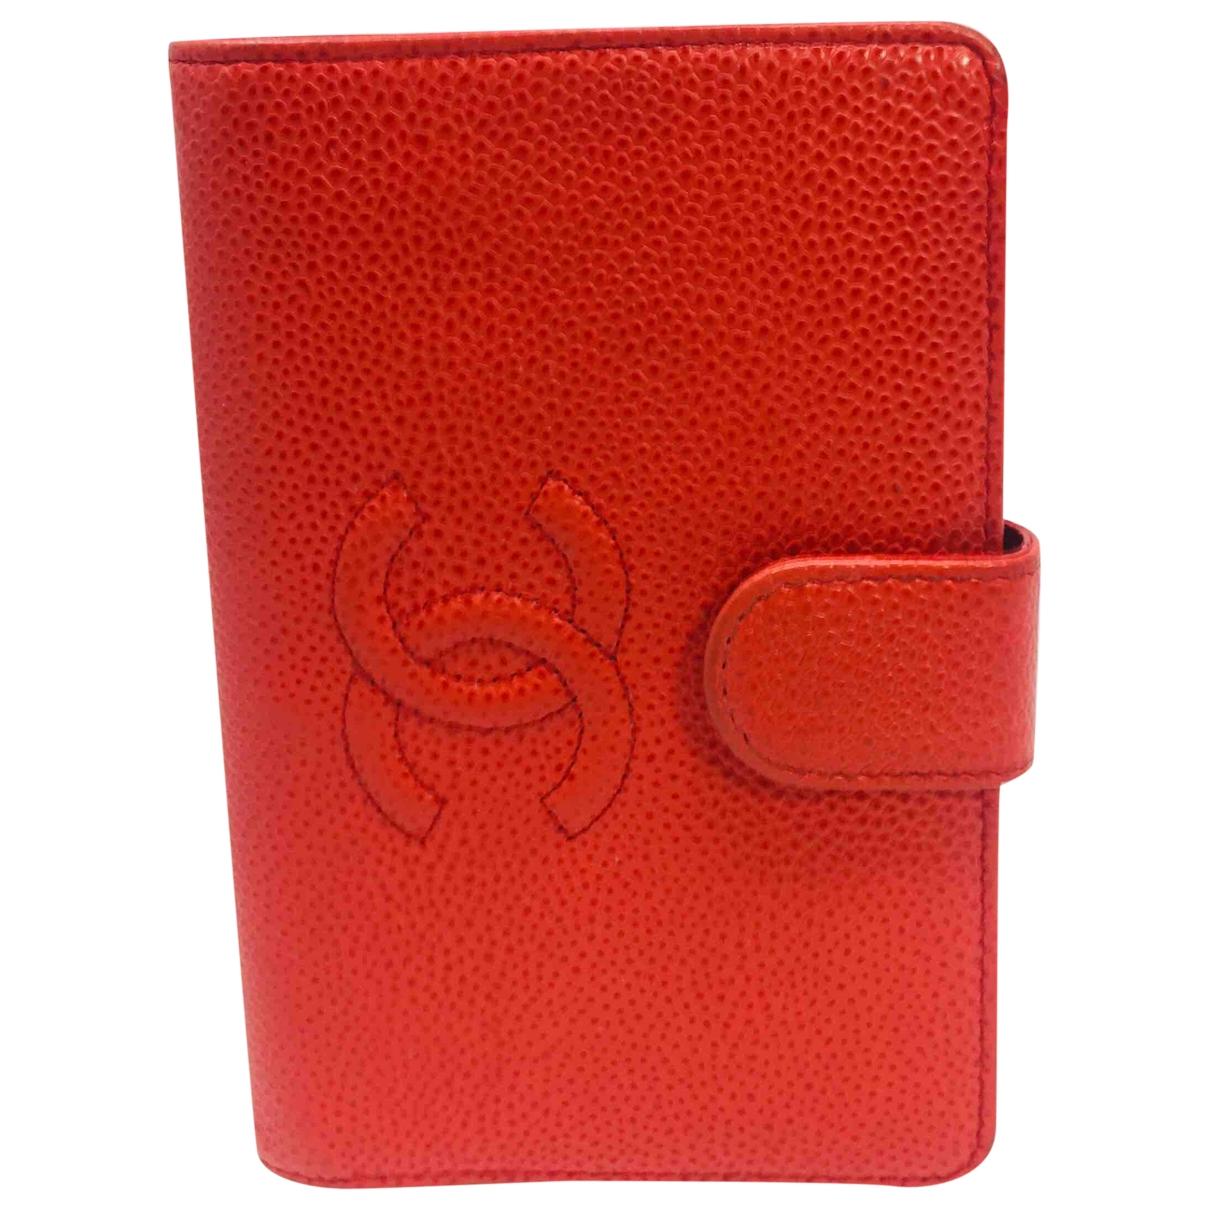 Chanel Timeless/Classique Portemonnaie in  Rot Leder